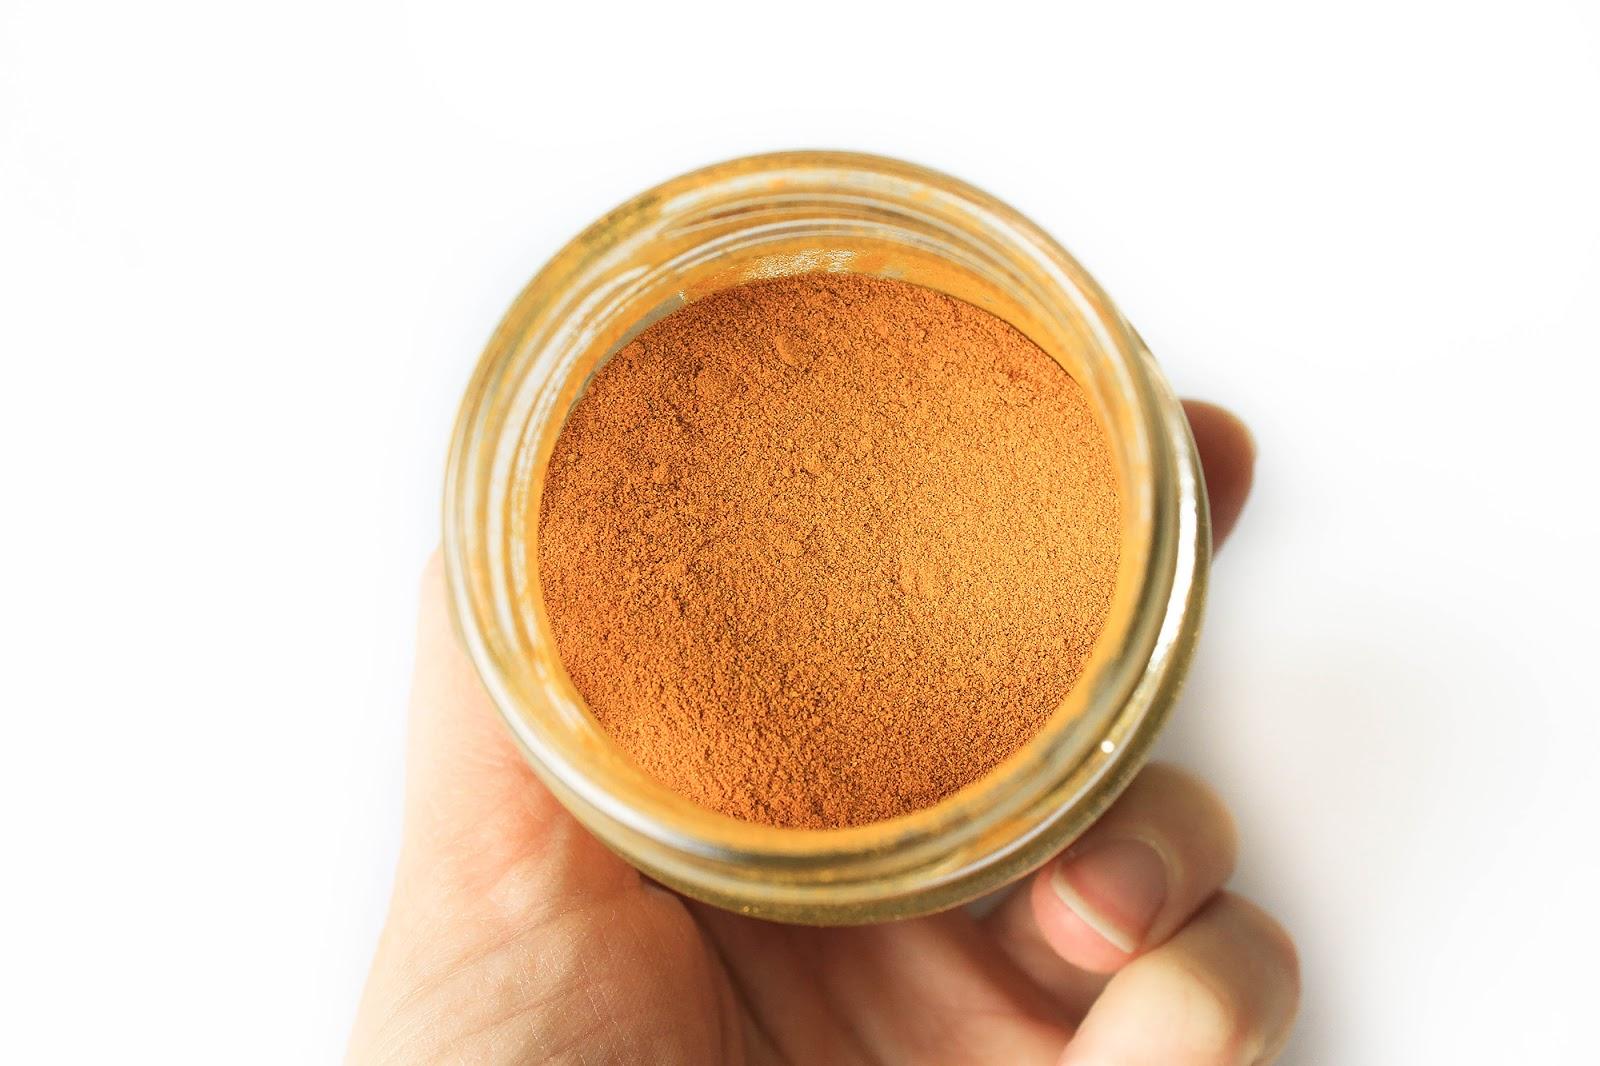 Organic Turmeric. Antioxidants, brightening, anti-inflammatory